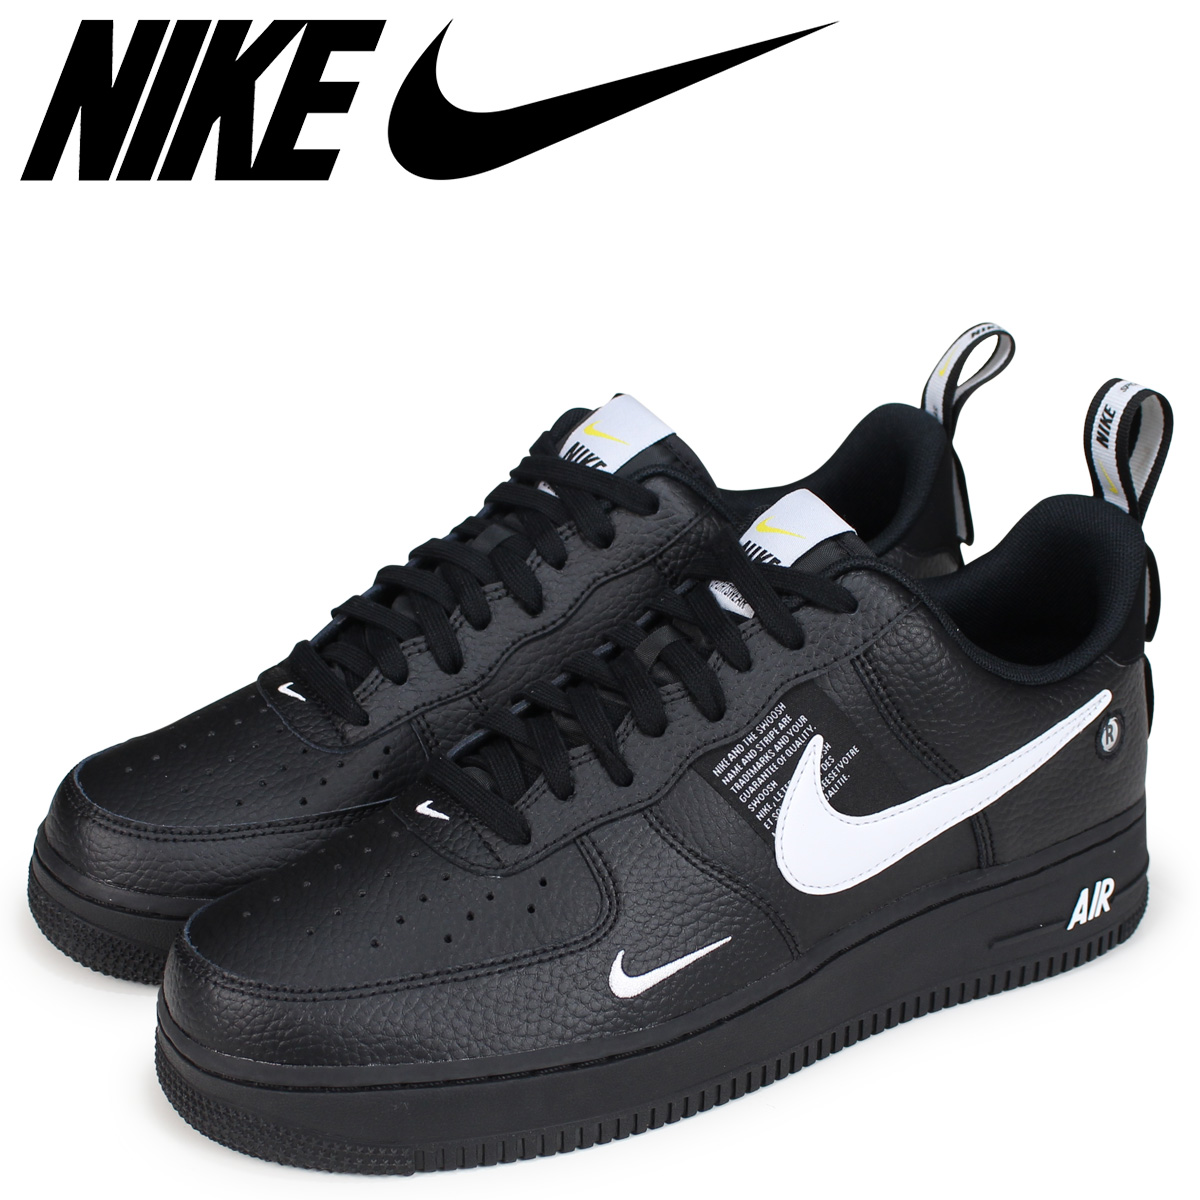 scarpe nike air force 1 07 lv8 utility